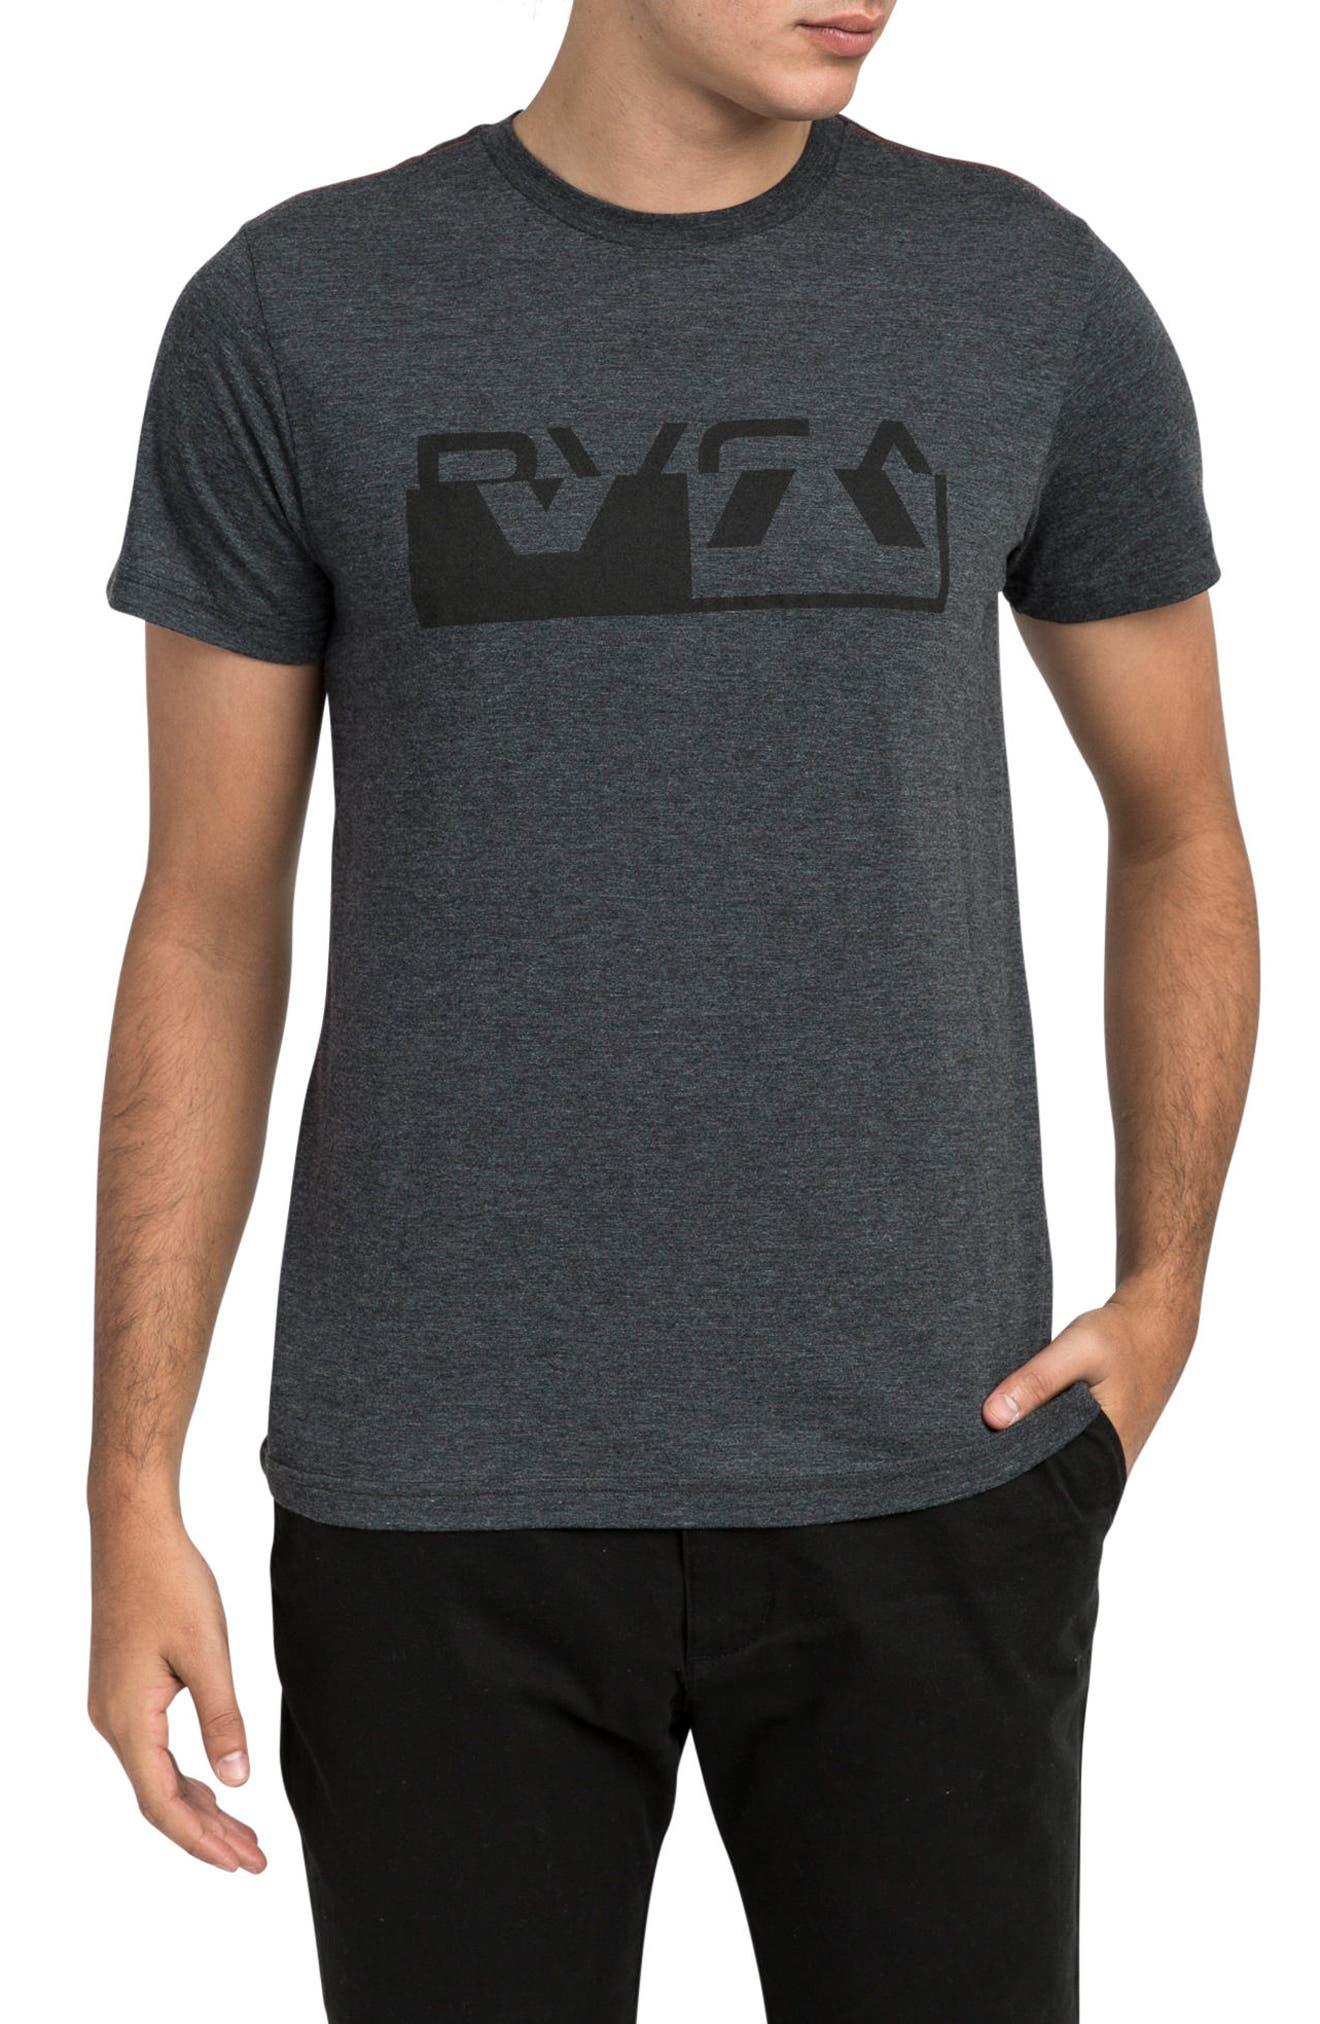 Co Brand Logo Graphic T-Shirt,                             Main thumbnail 1, color,                             Rvca Black